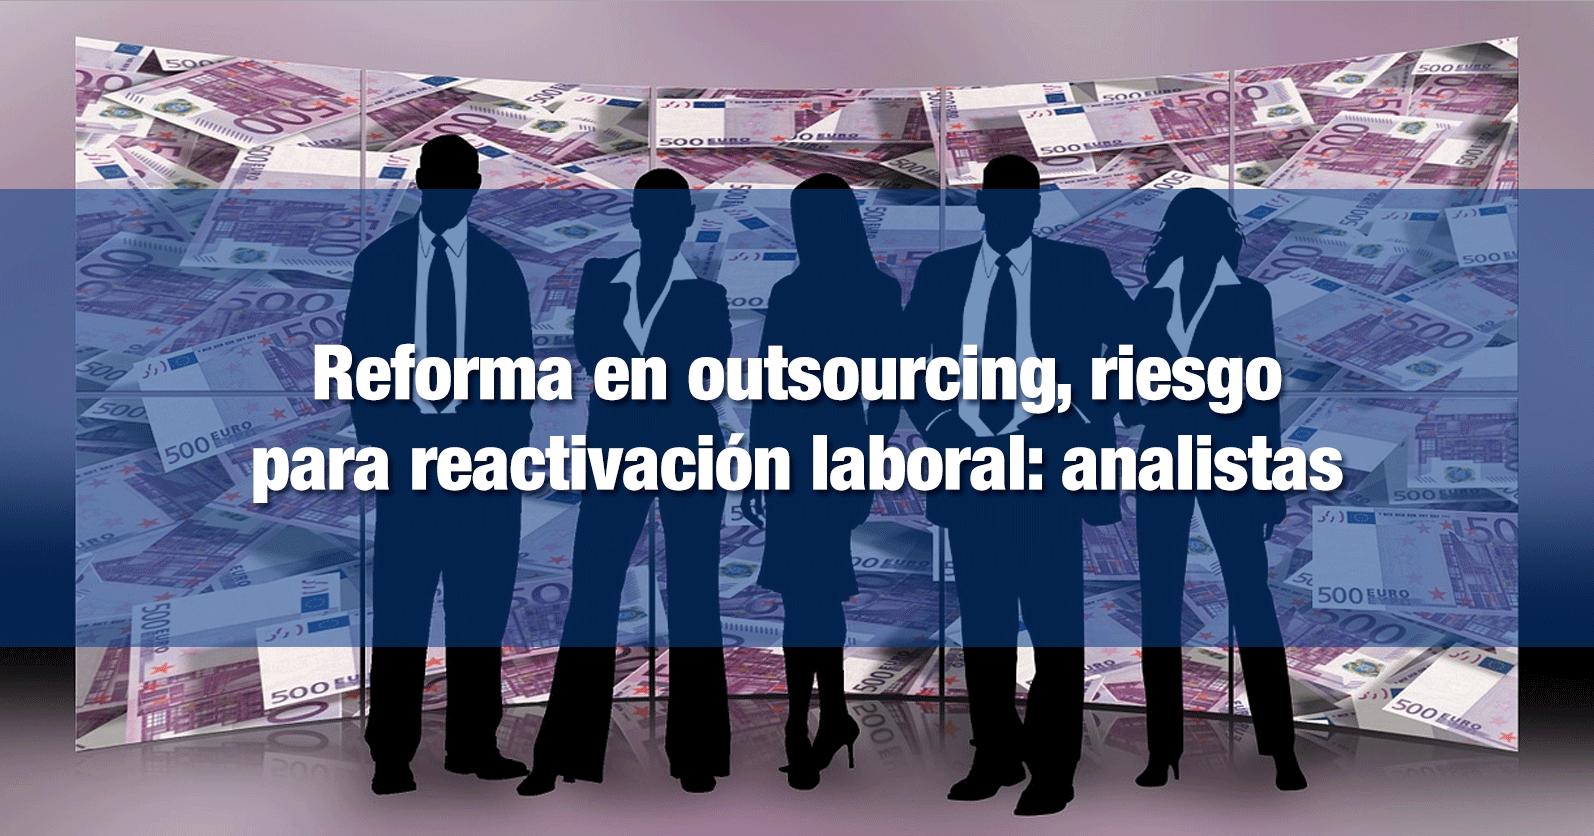 Reforma en outsourcing, riesgo para reactivación laboral: analistas